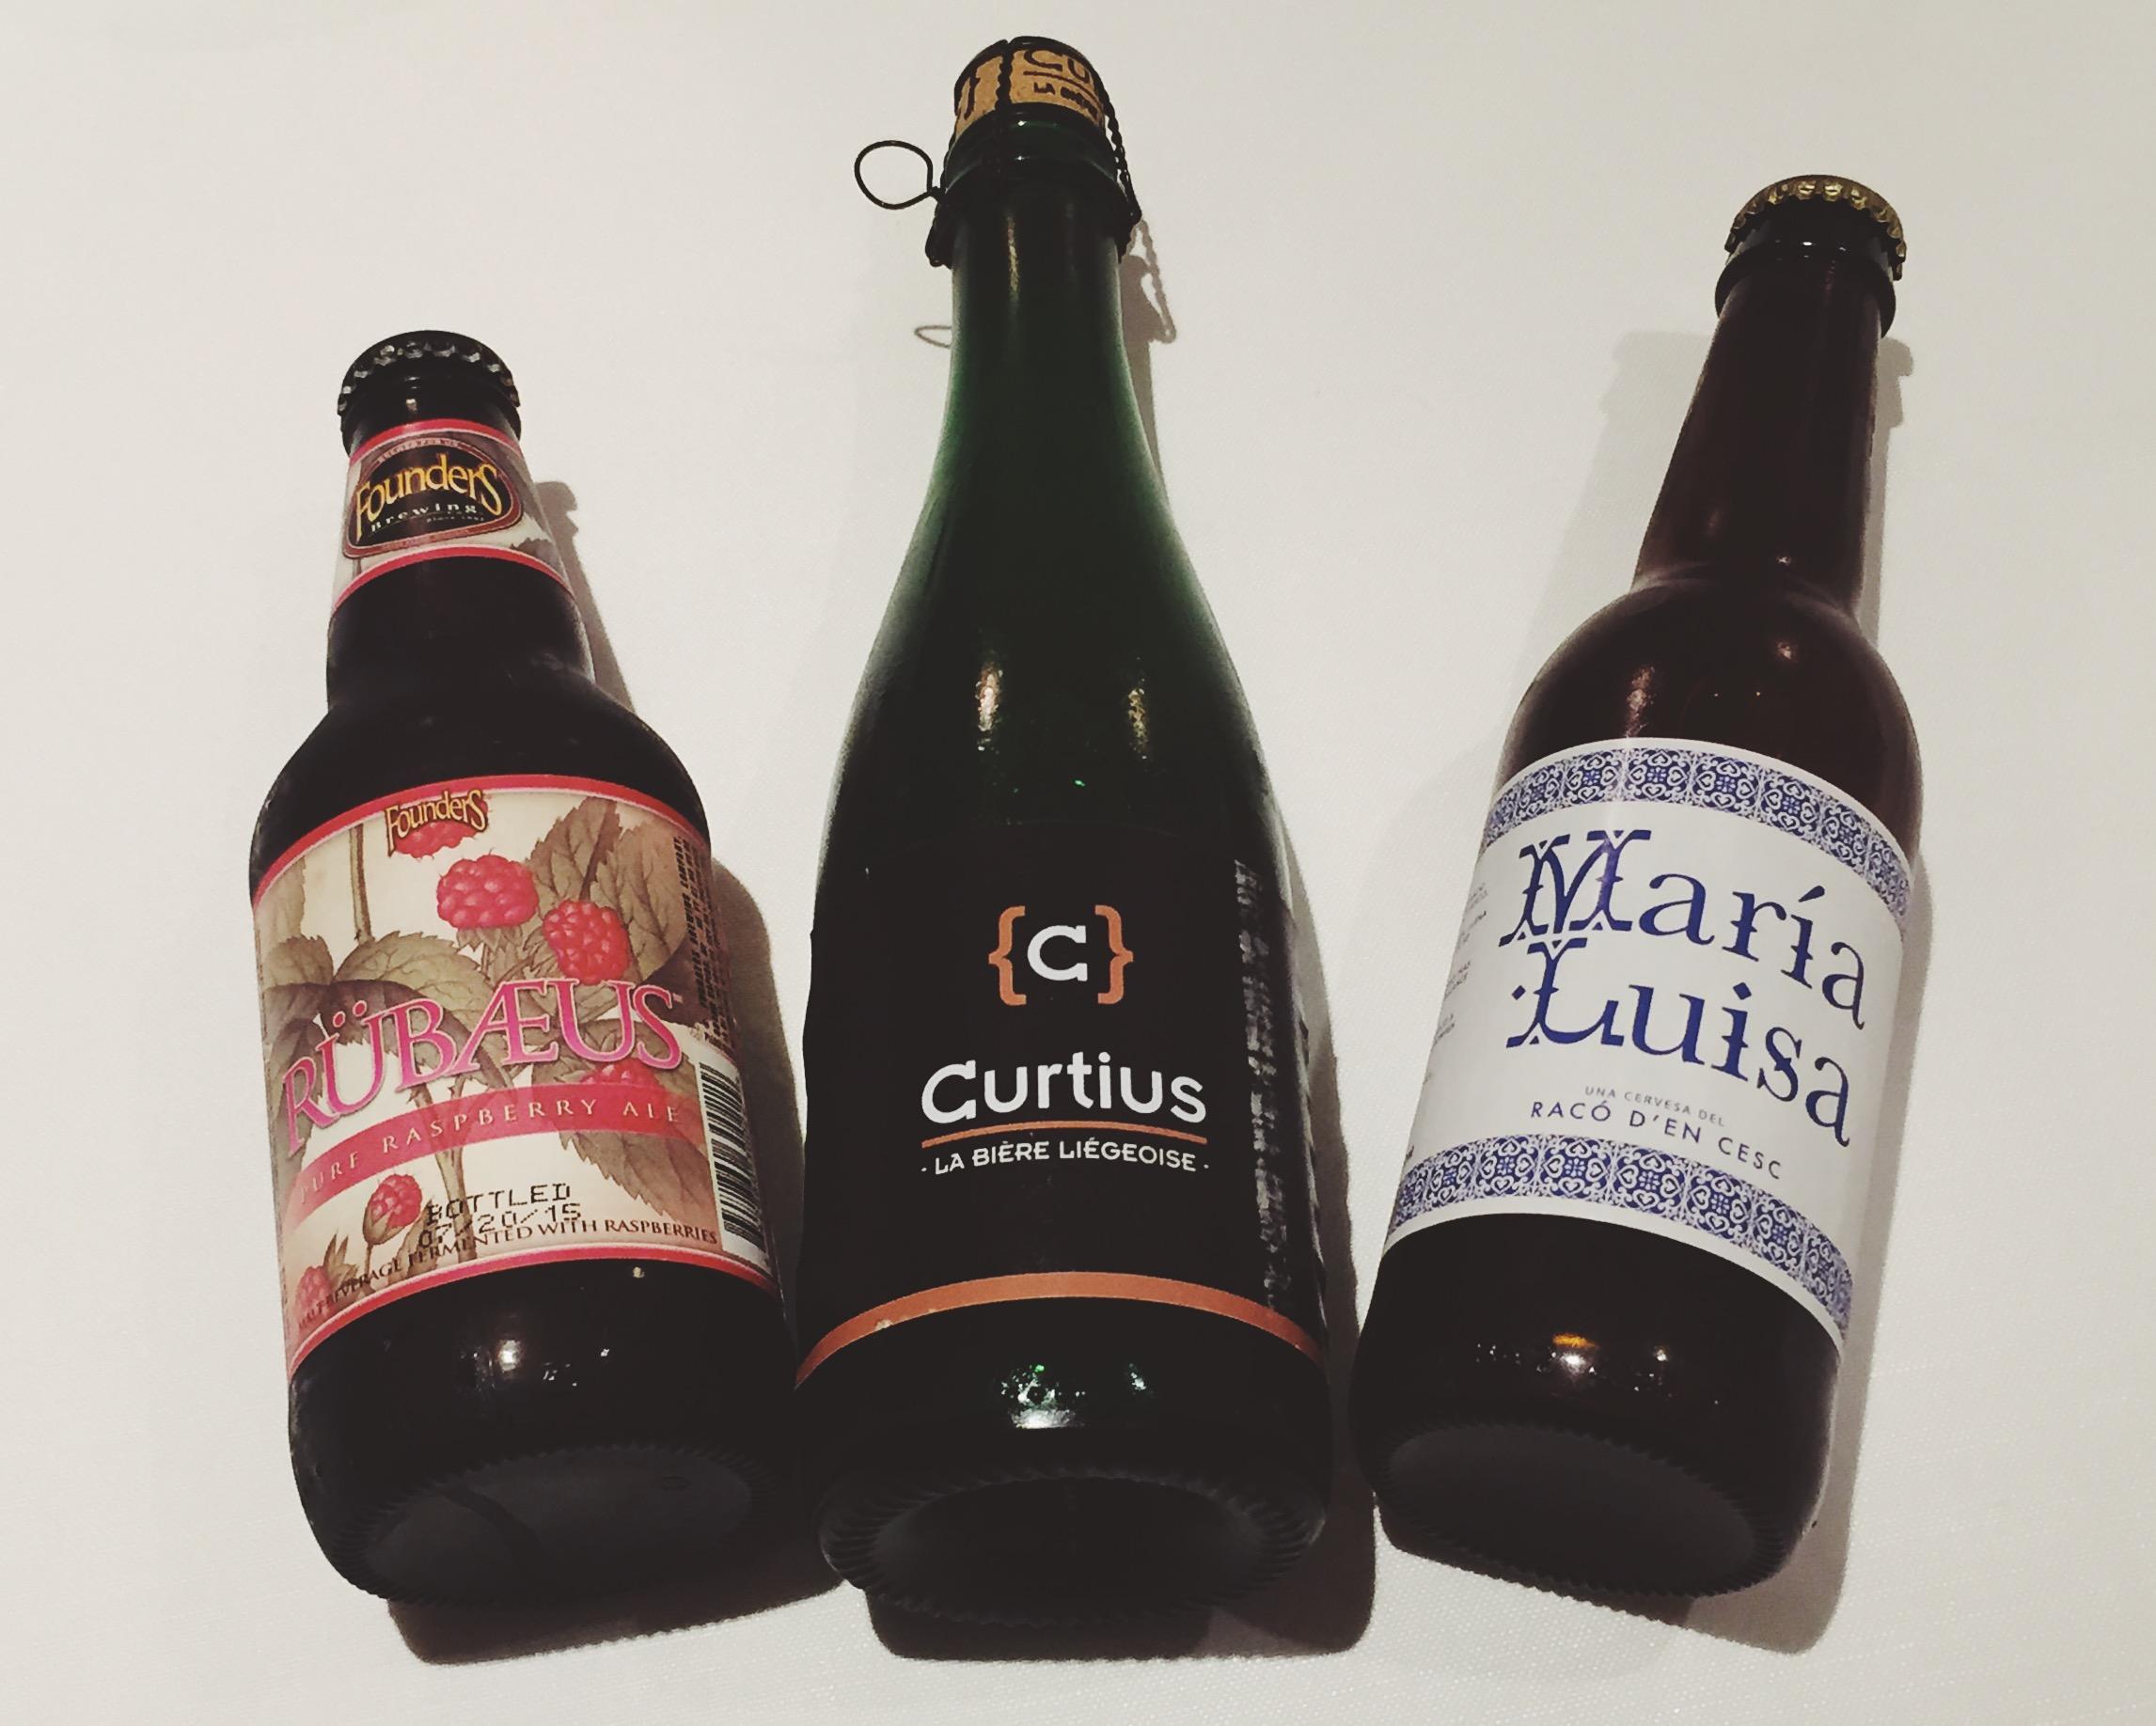 Cervezas de El Raco d'en Cesc